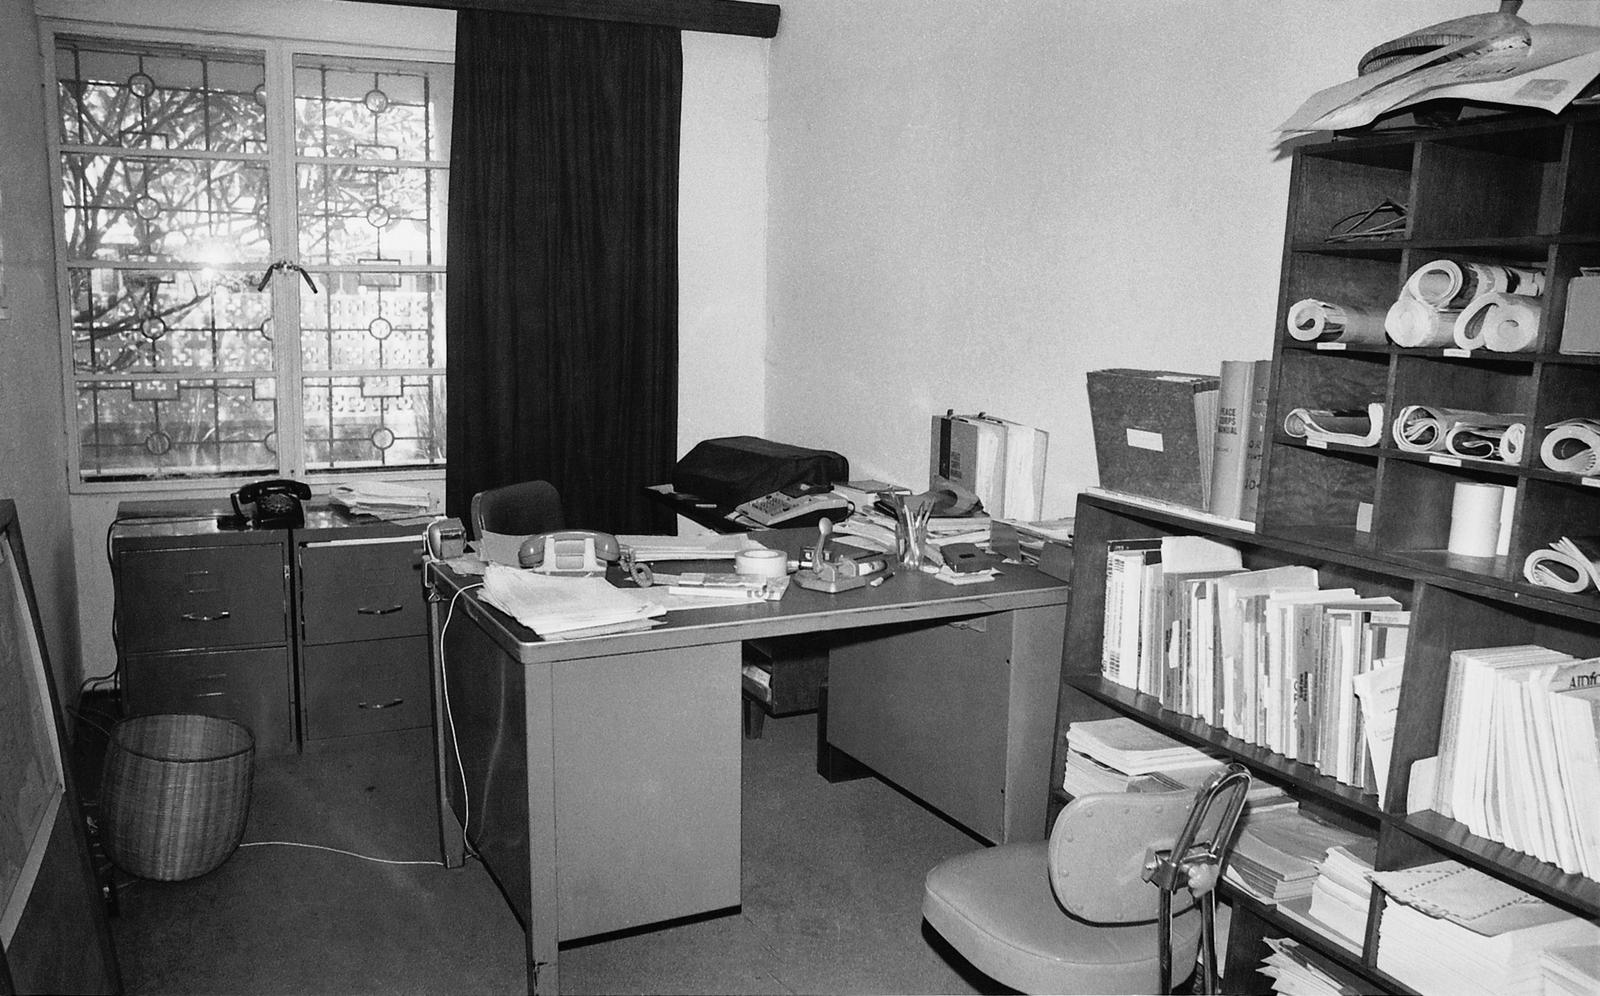 Kigali - Annex Office Building - 1979